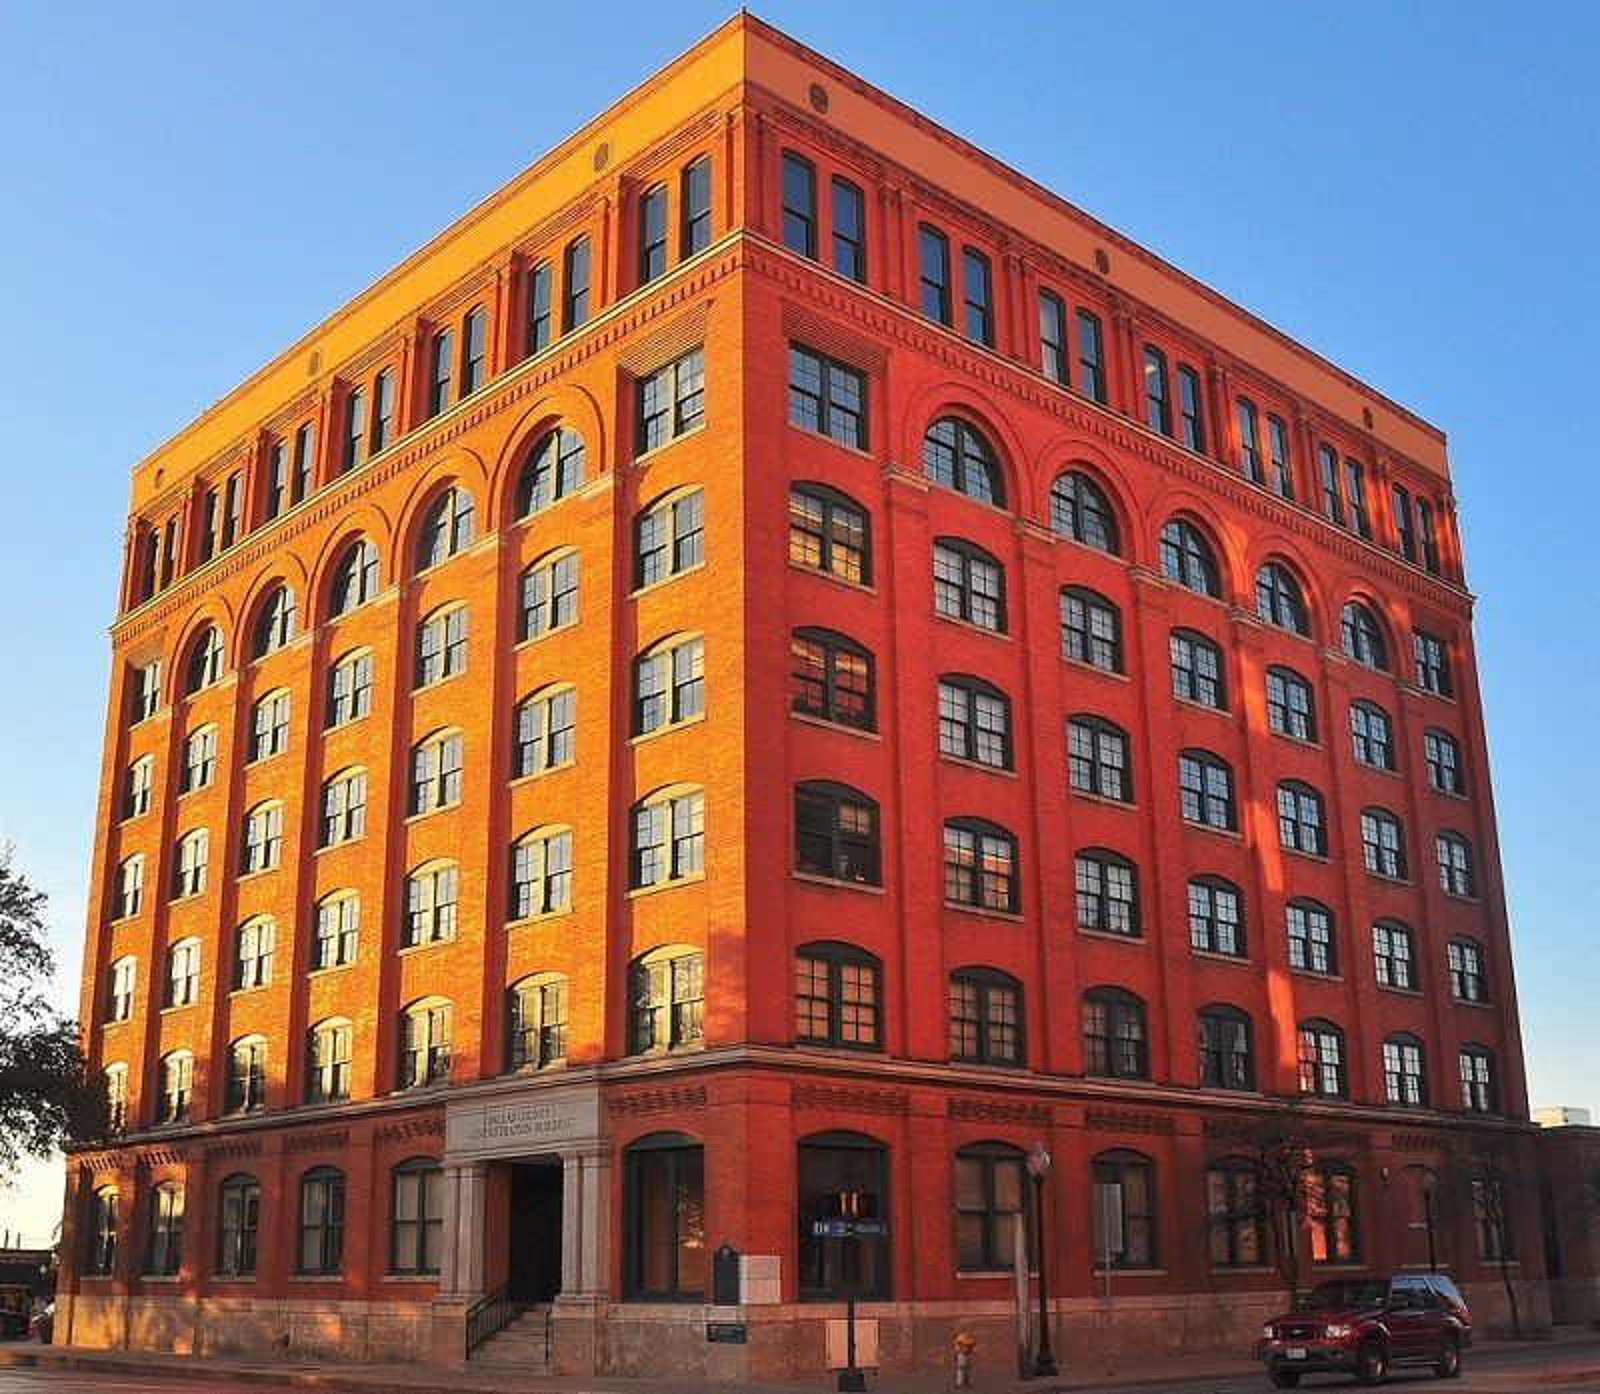 Texas School Book Depository et le Six Floor Museum, Dallas